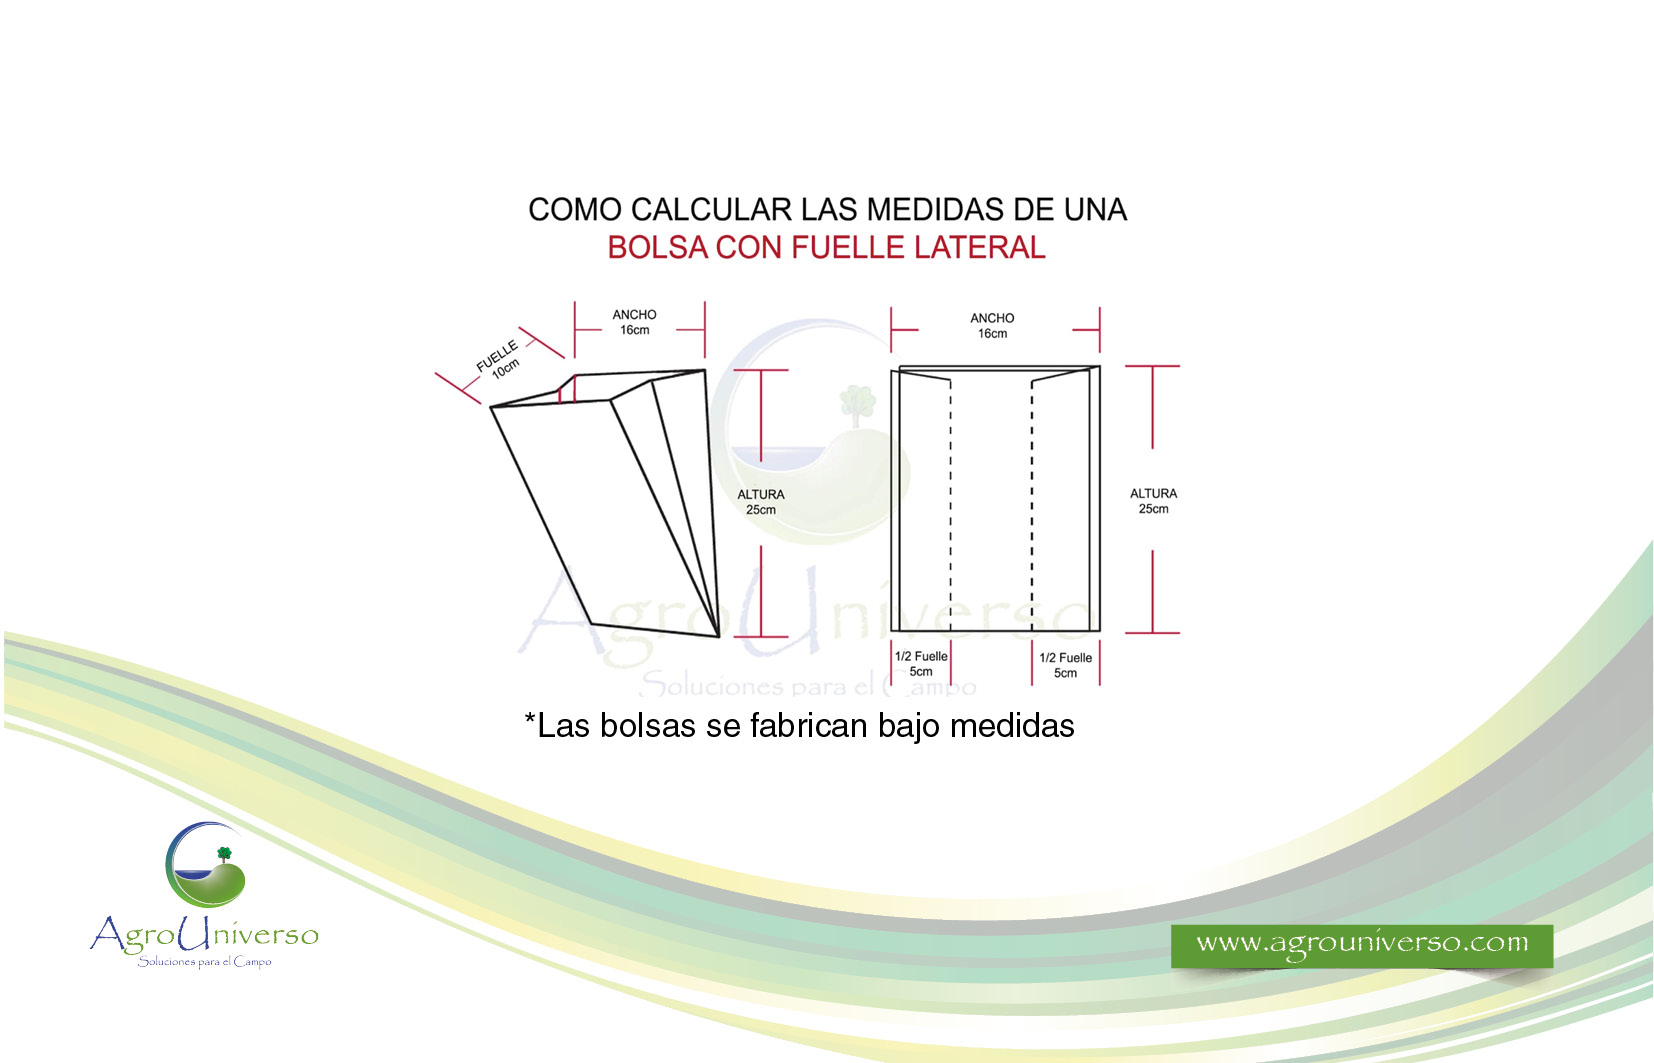 Catlogo-de-productos-Agrouniverso-27